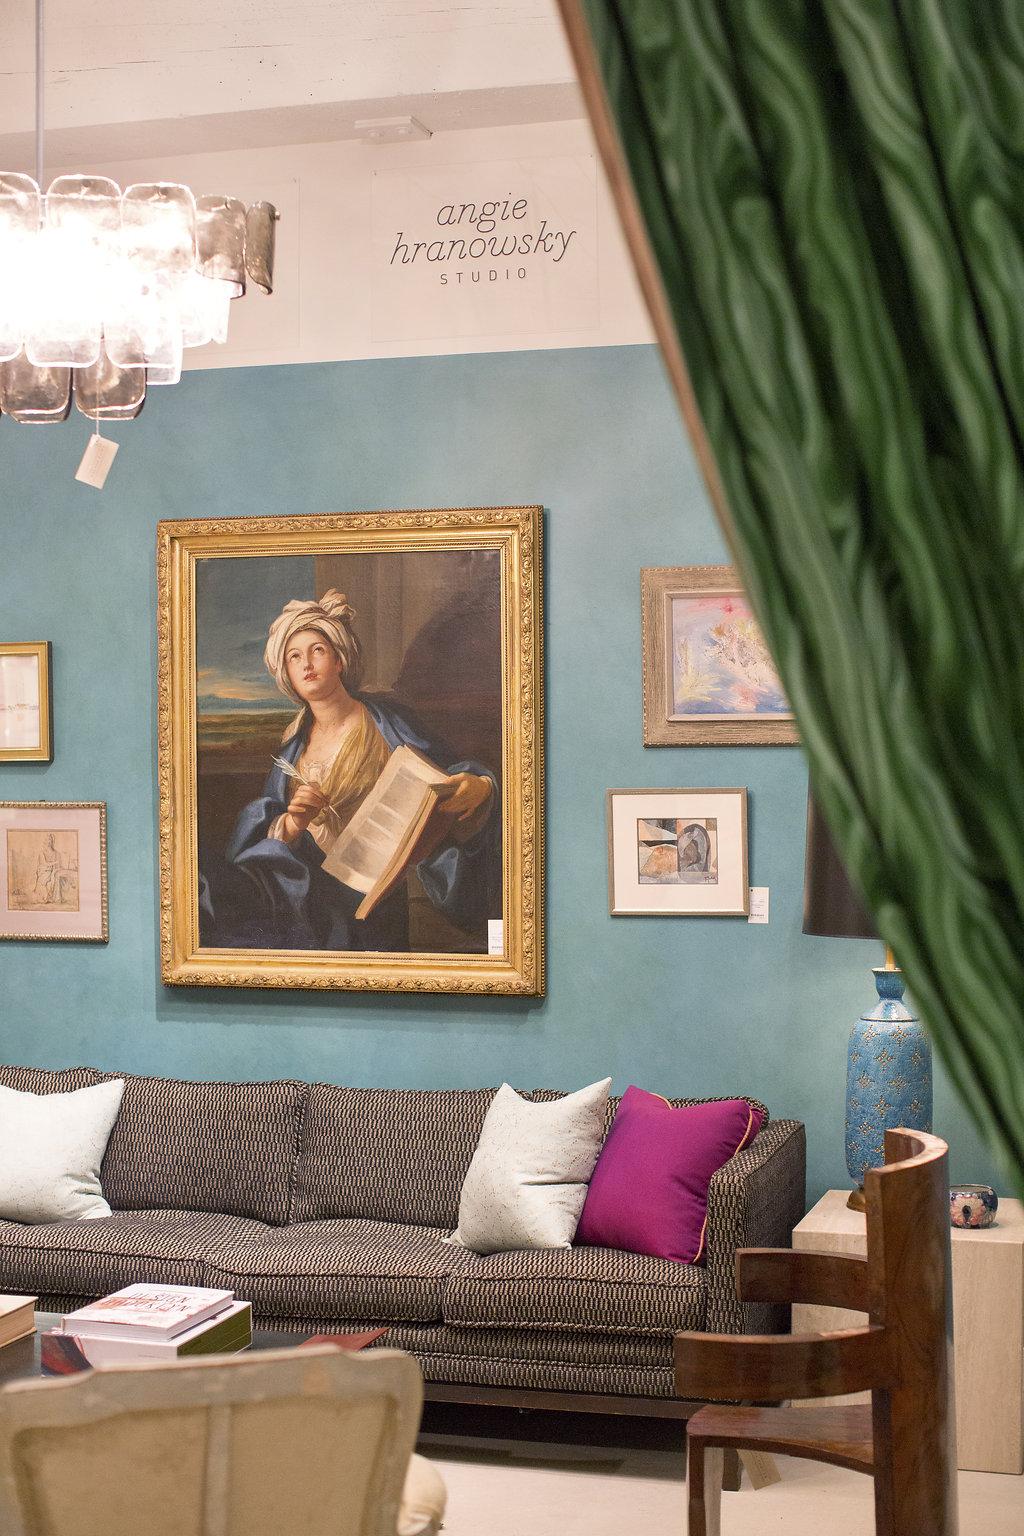 Angie Hranowsky's bright modern Atelier